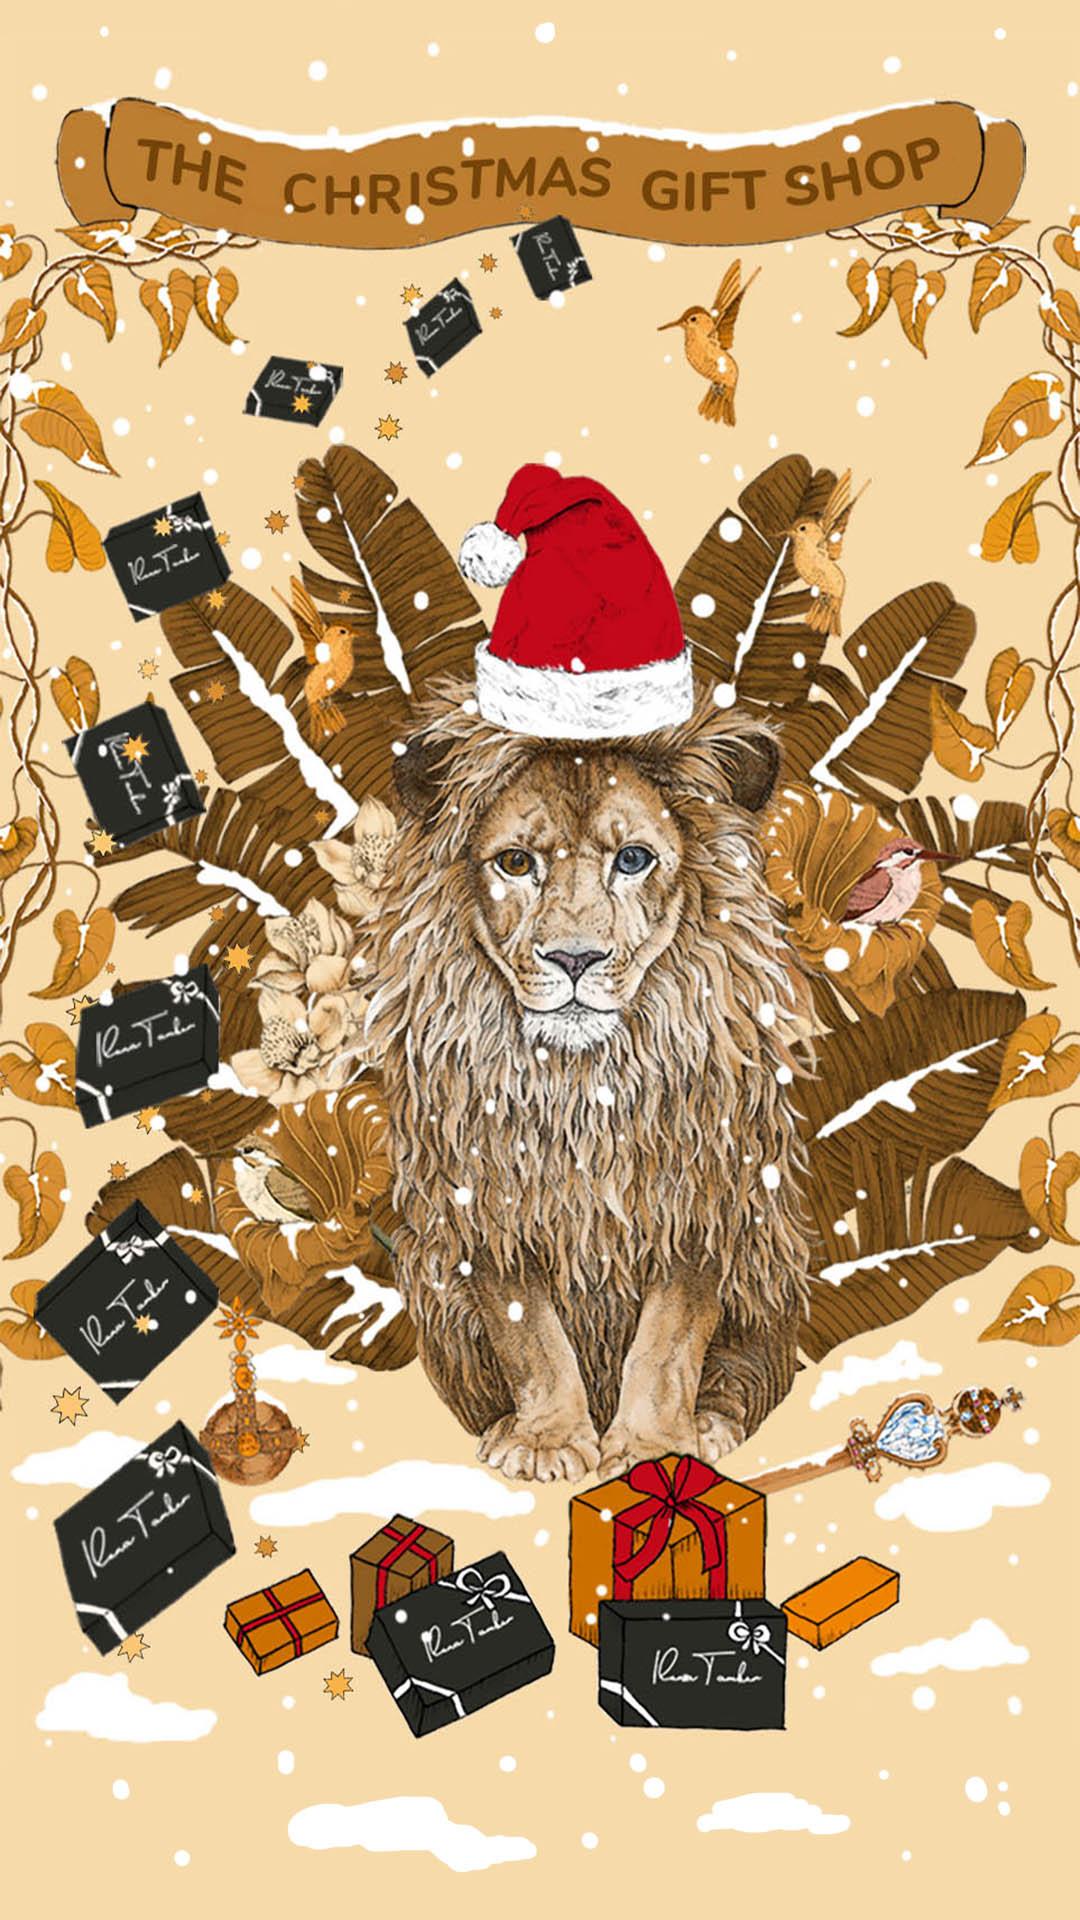 Ilona Tambor Art Silk Scarves Christmas Gift Shop